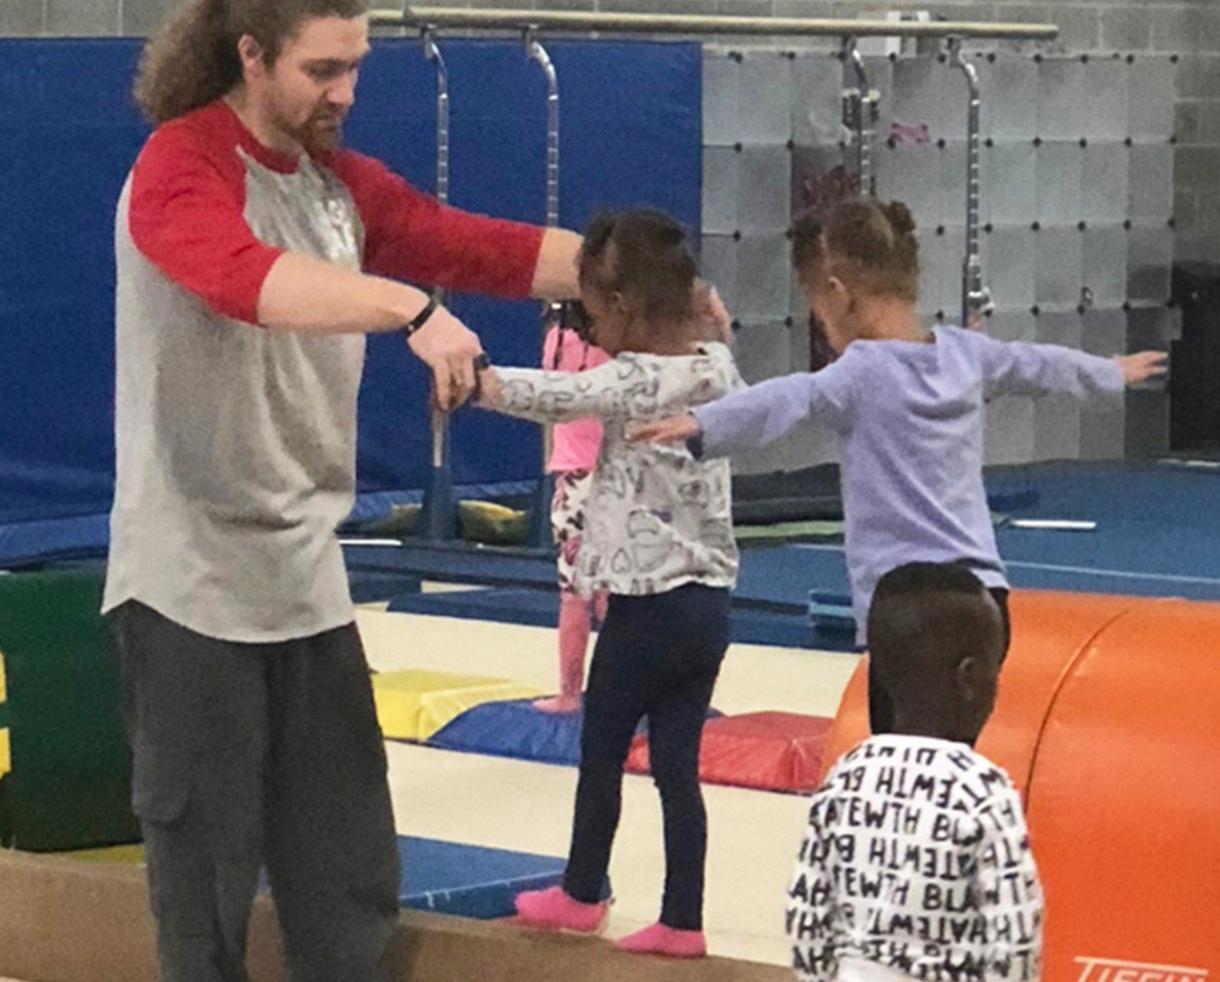 KidsTime.Live Toddler or Preschool Gym Classes